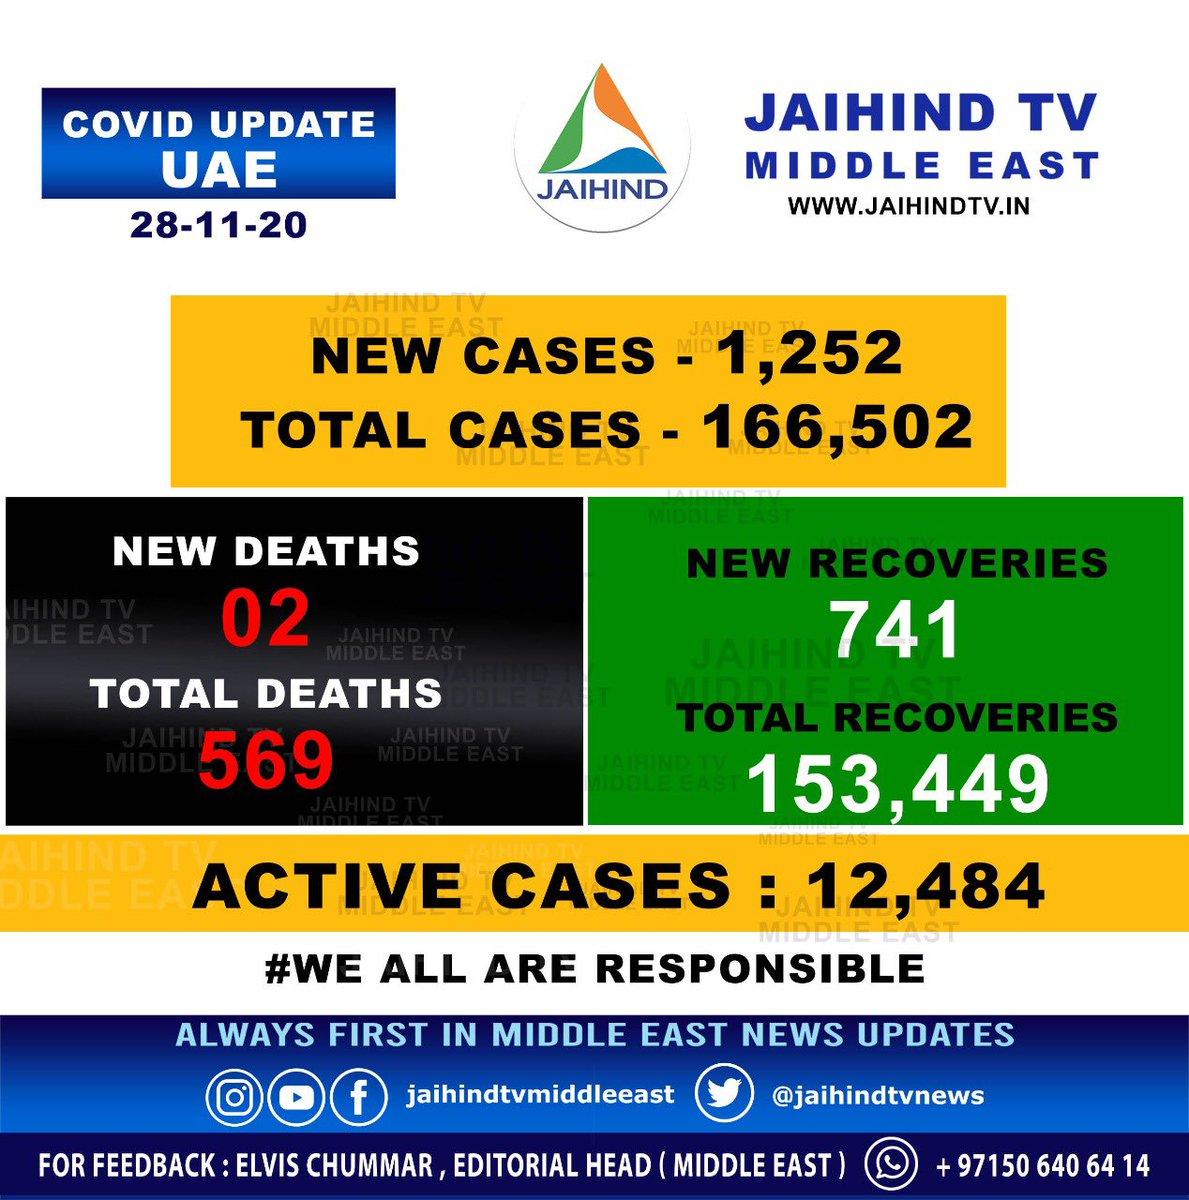 #UAE #Latest #Covid #Update   #Covid_19 #Coronavirus #COVID19 #Jaihind_TV #Covid #Covid_19 #Coronavirus #COVID19 #COVID #WeAreAllResponsible #WeShallOvercome #we_are_all_responisble #Like #Follow #Share #YouAreResponsible #You_Are_Responsible #Pandemic #pandemic2020